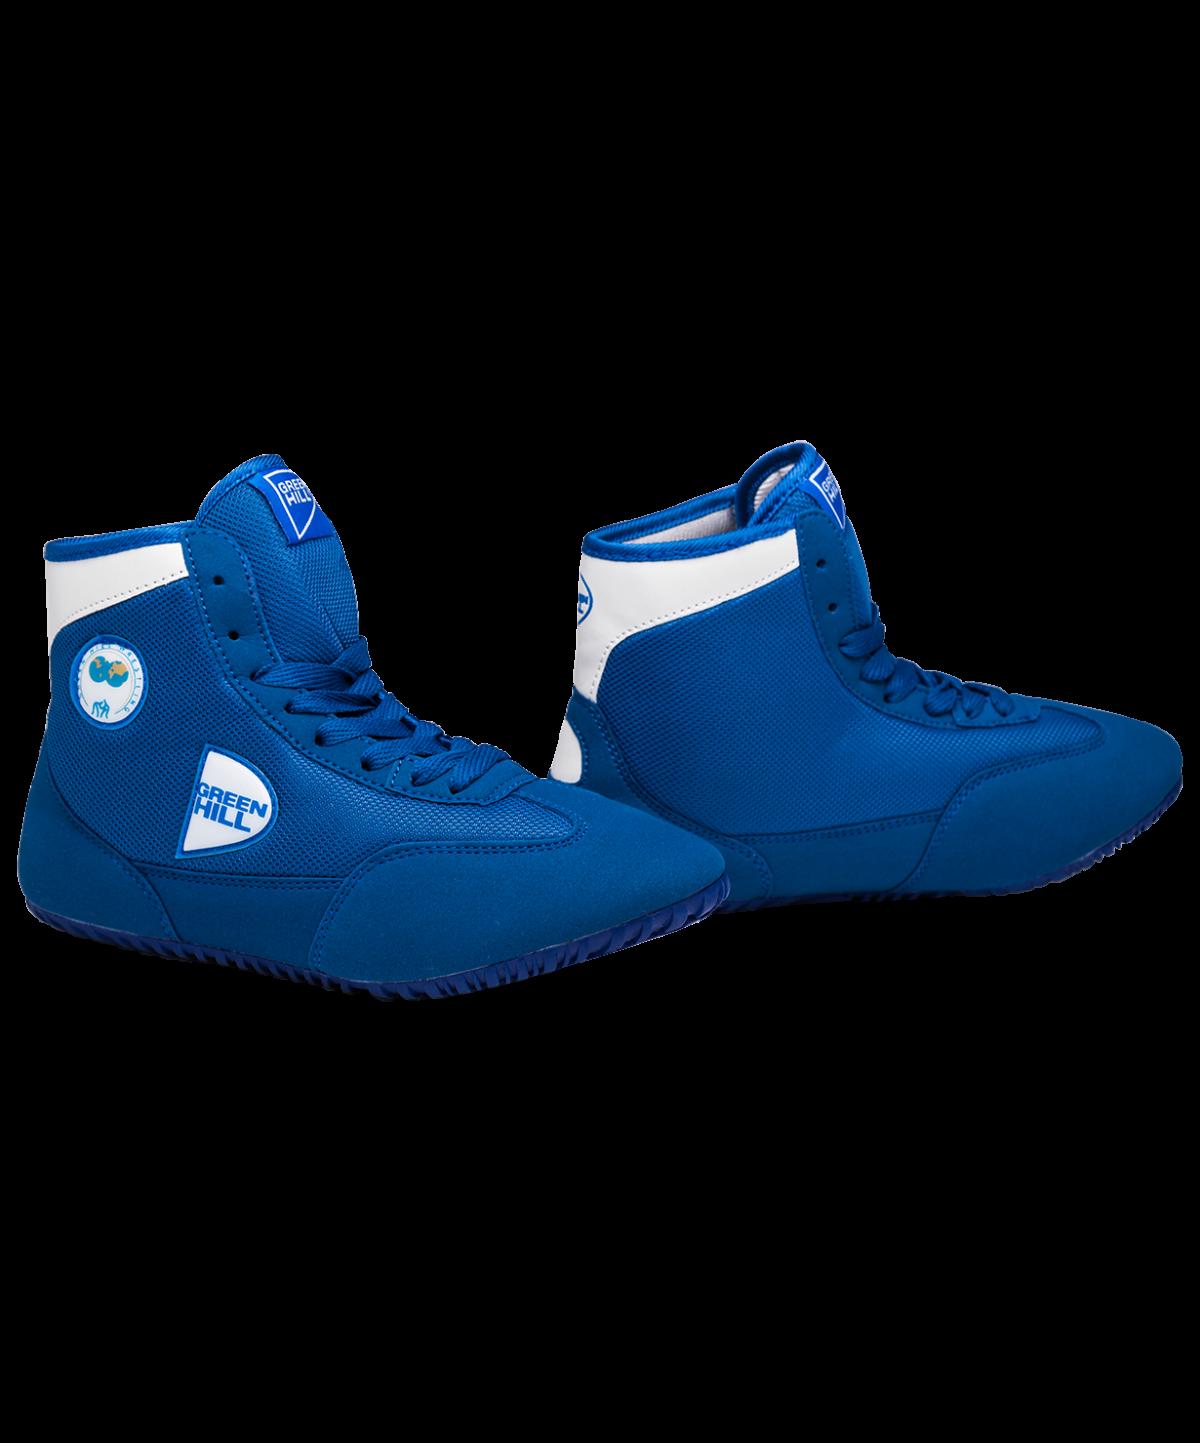 GREEN HILL Обувь для борьбы  GWB-3052/GWB-3055: синий/белый - 1